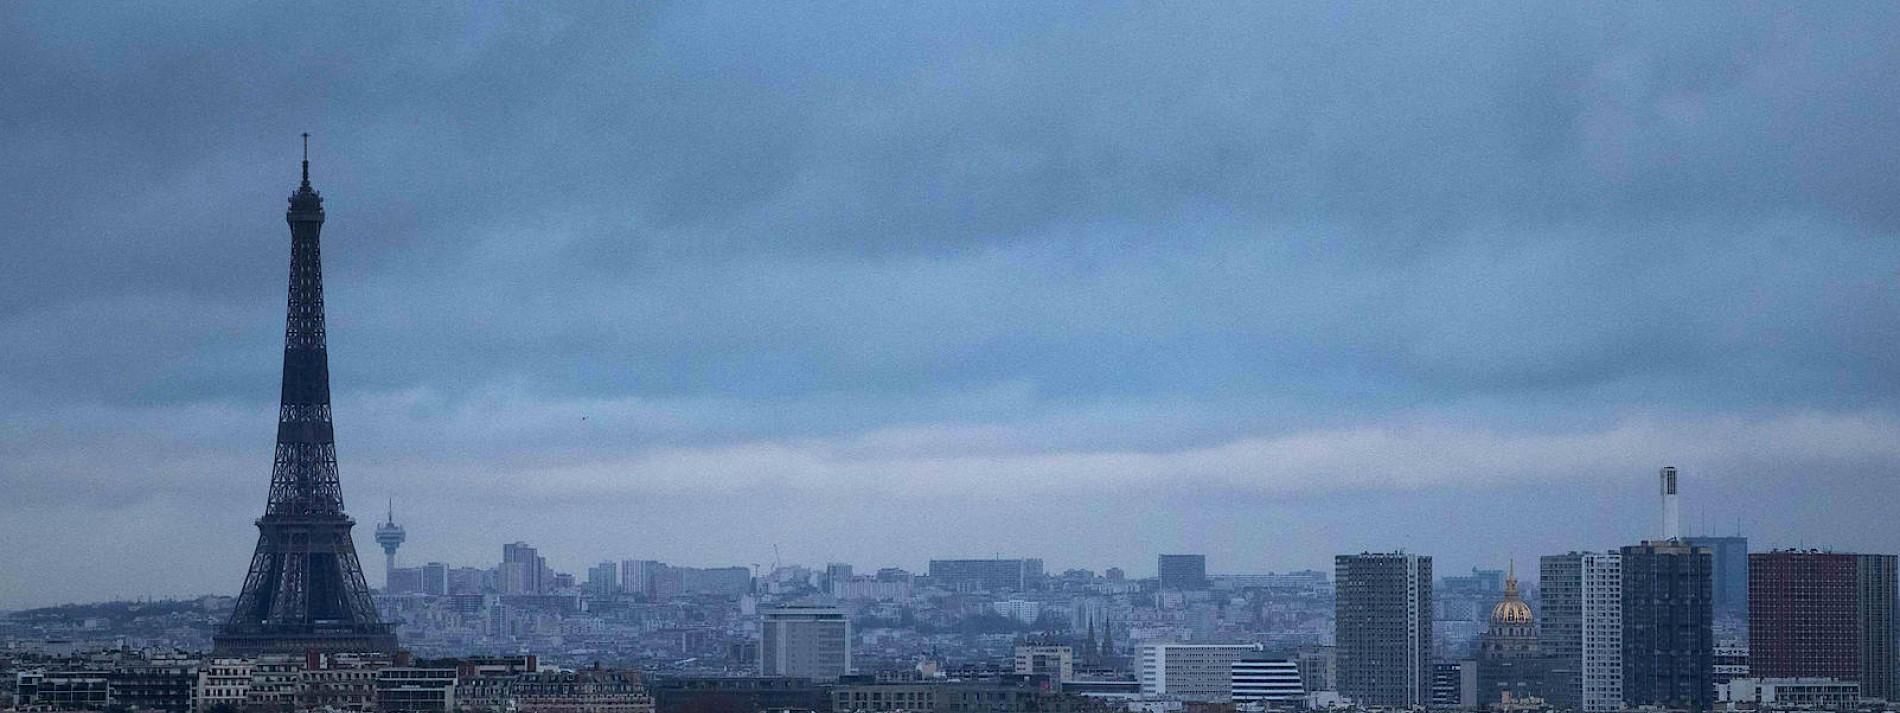 Ende der Biennale Paris